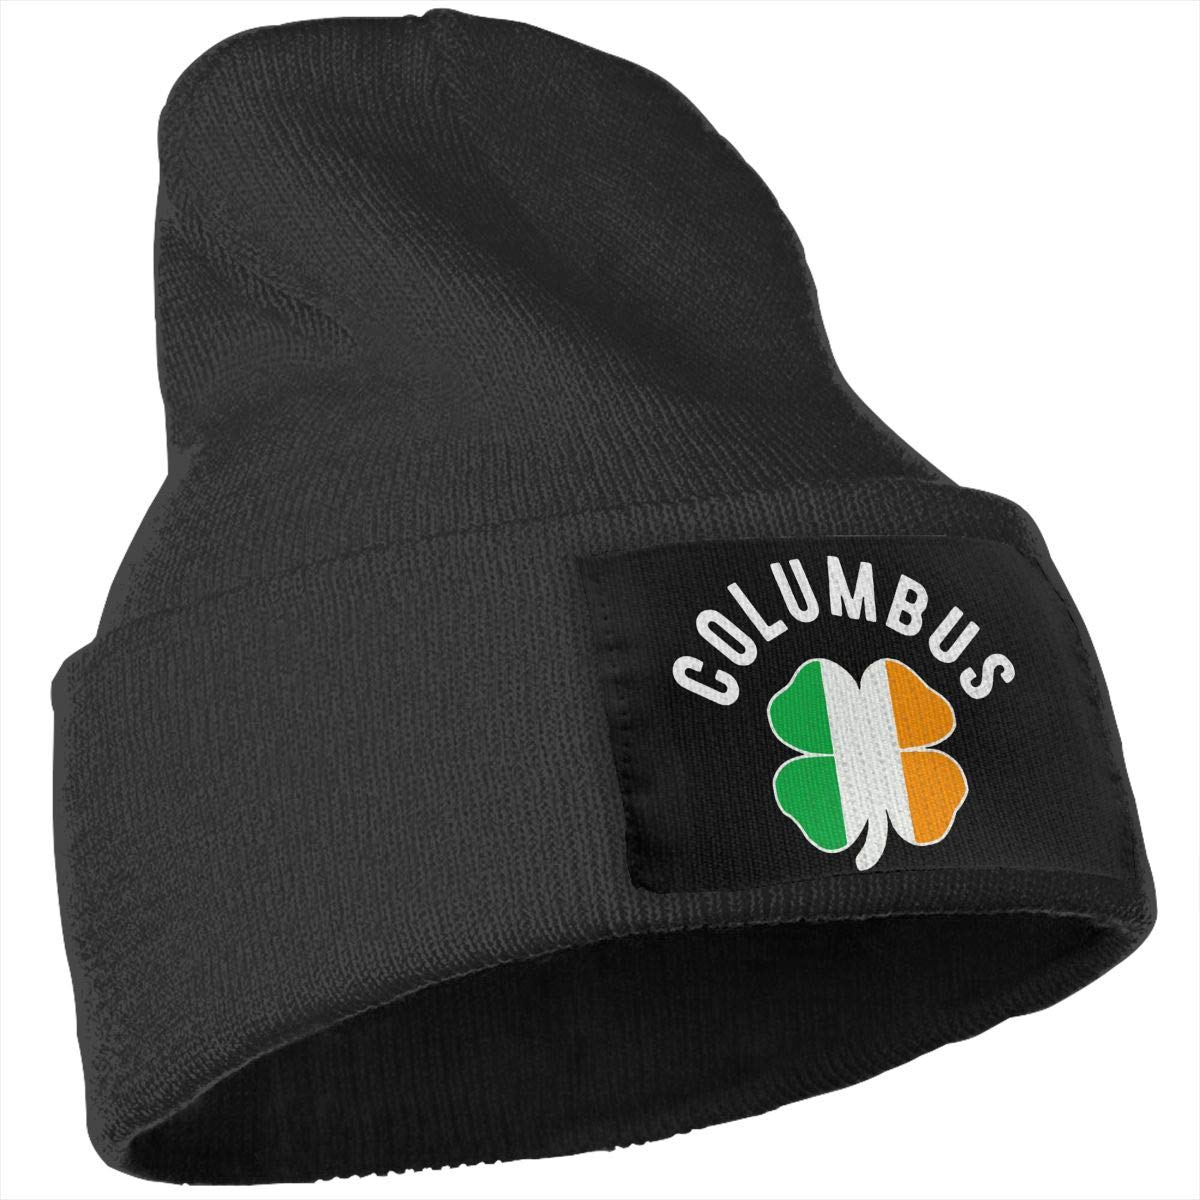 COLLJL-8 Men//Women Columbus Outdoor Fashion Knit Beanies Hat Soft Winter Skull Caps